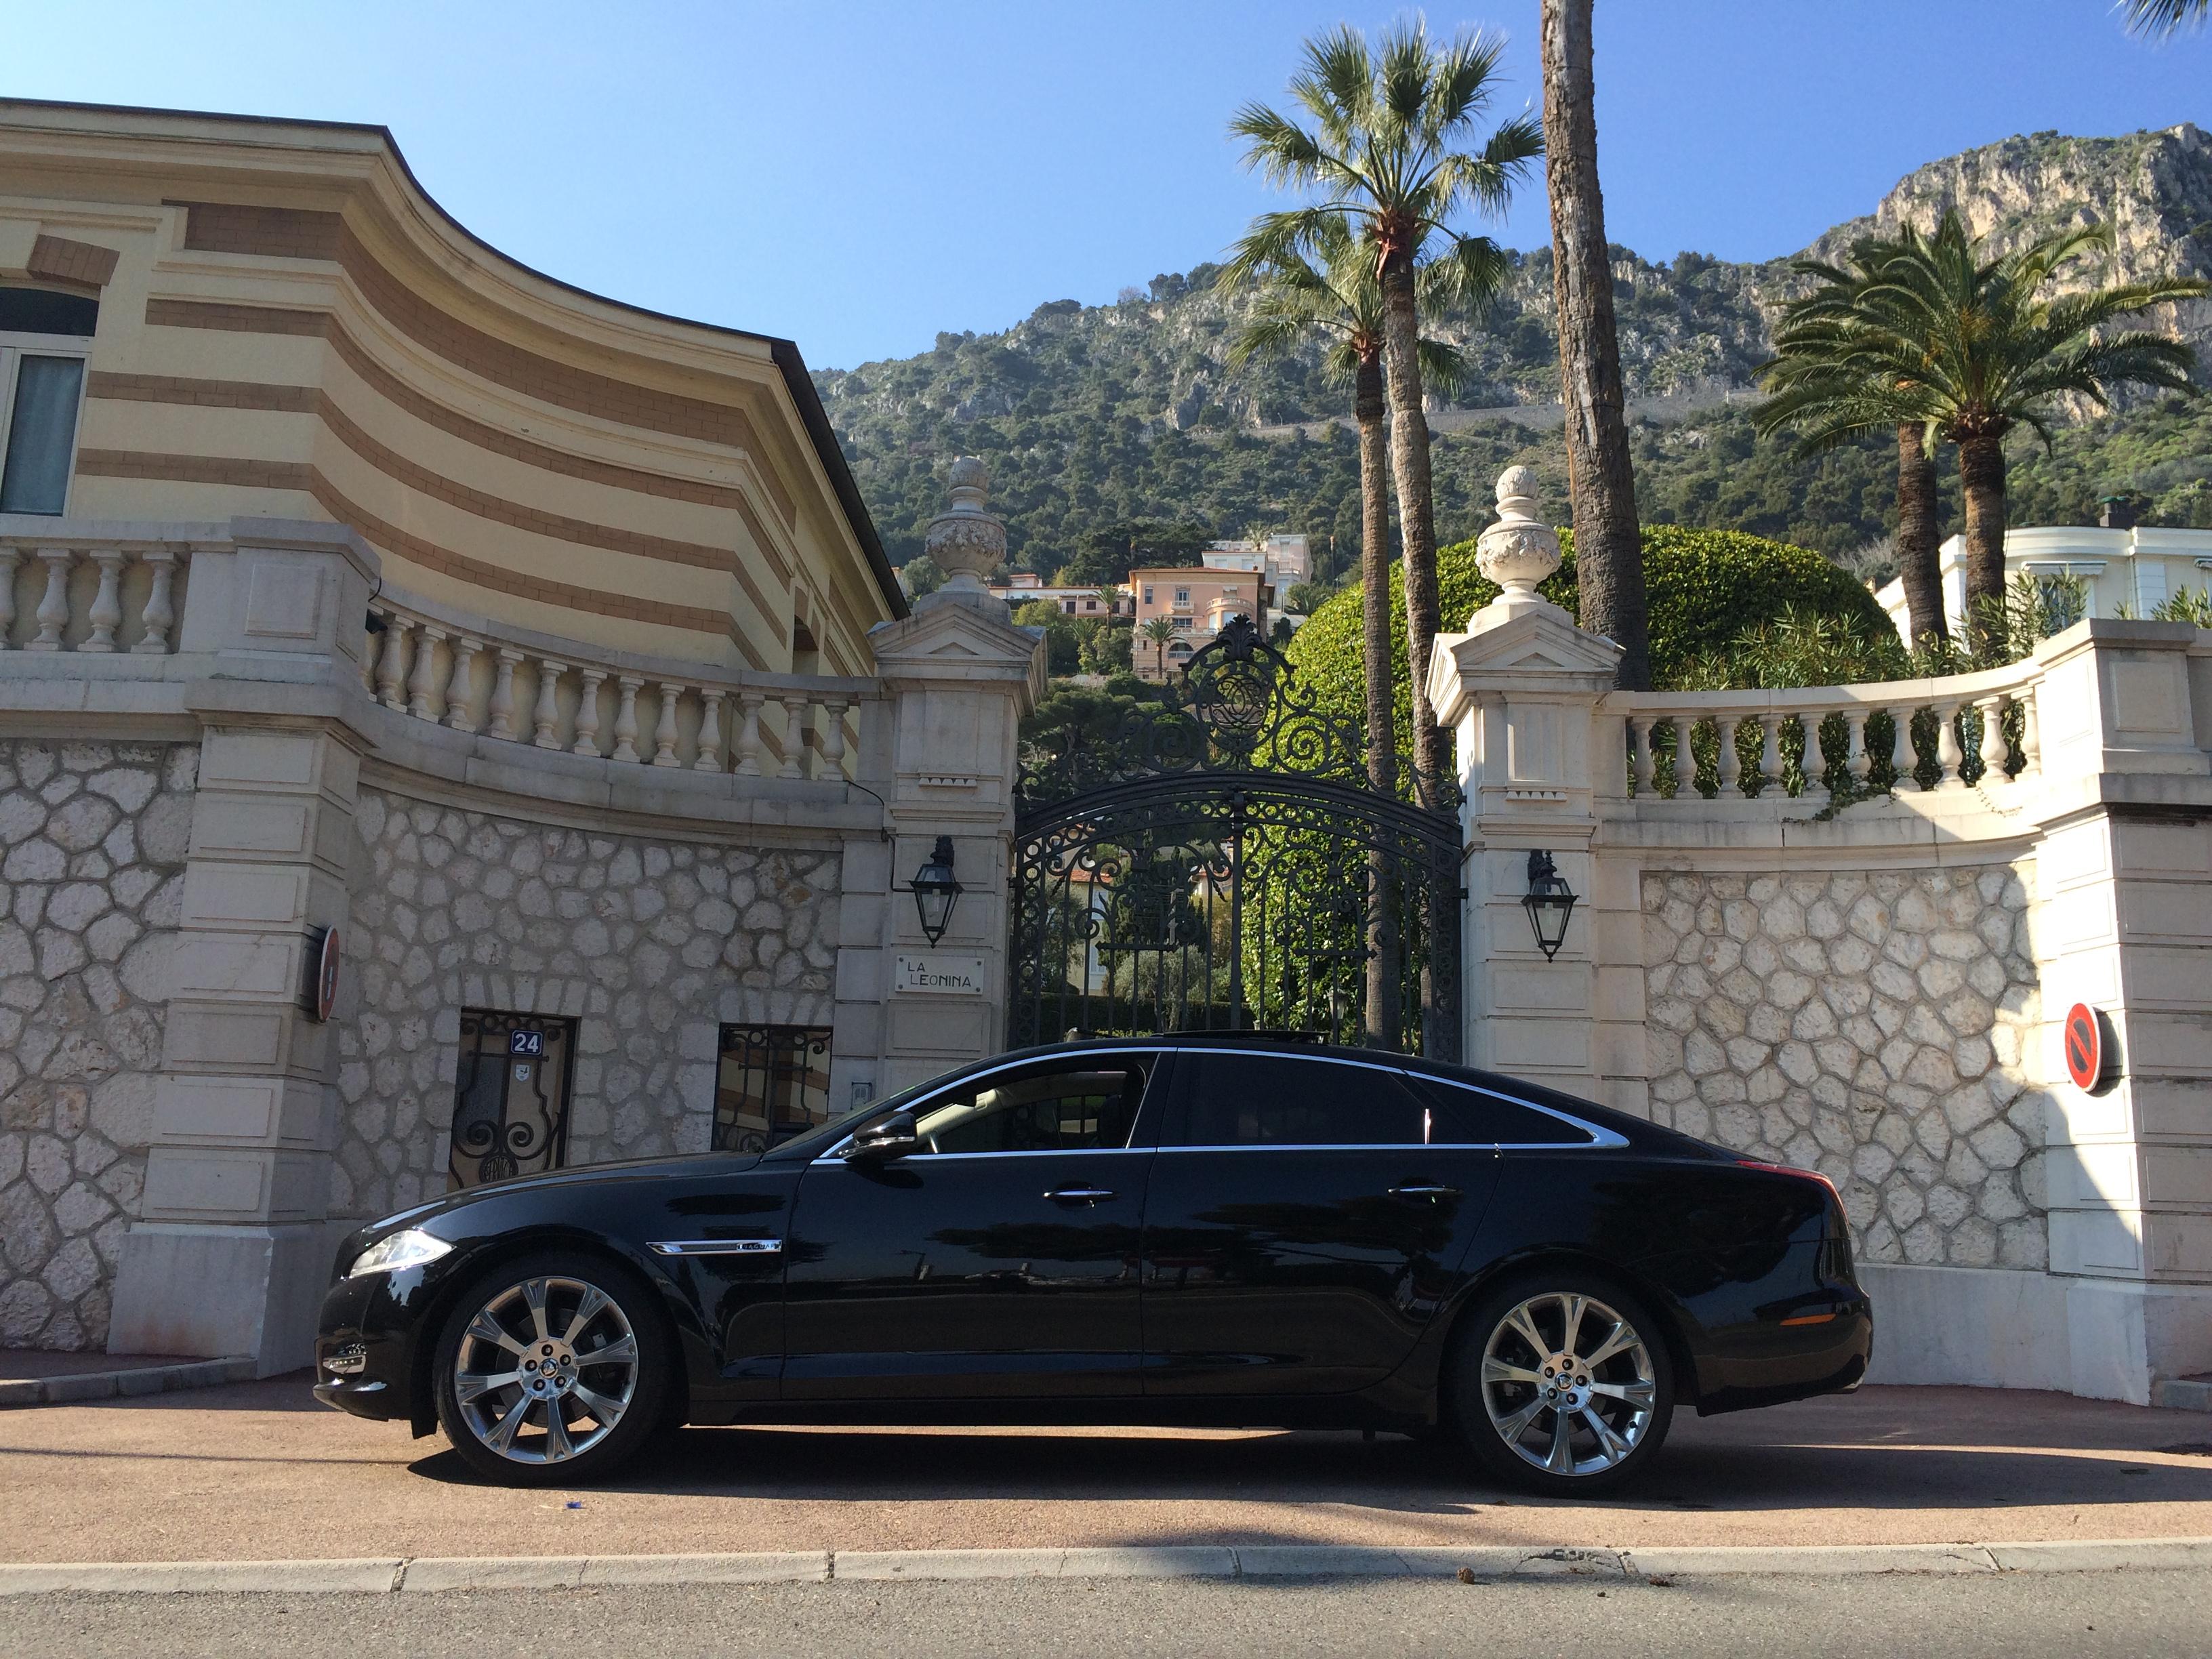 voiture avec chauffeur Marseille